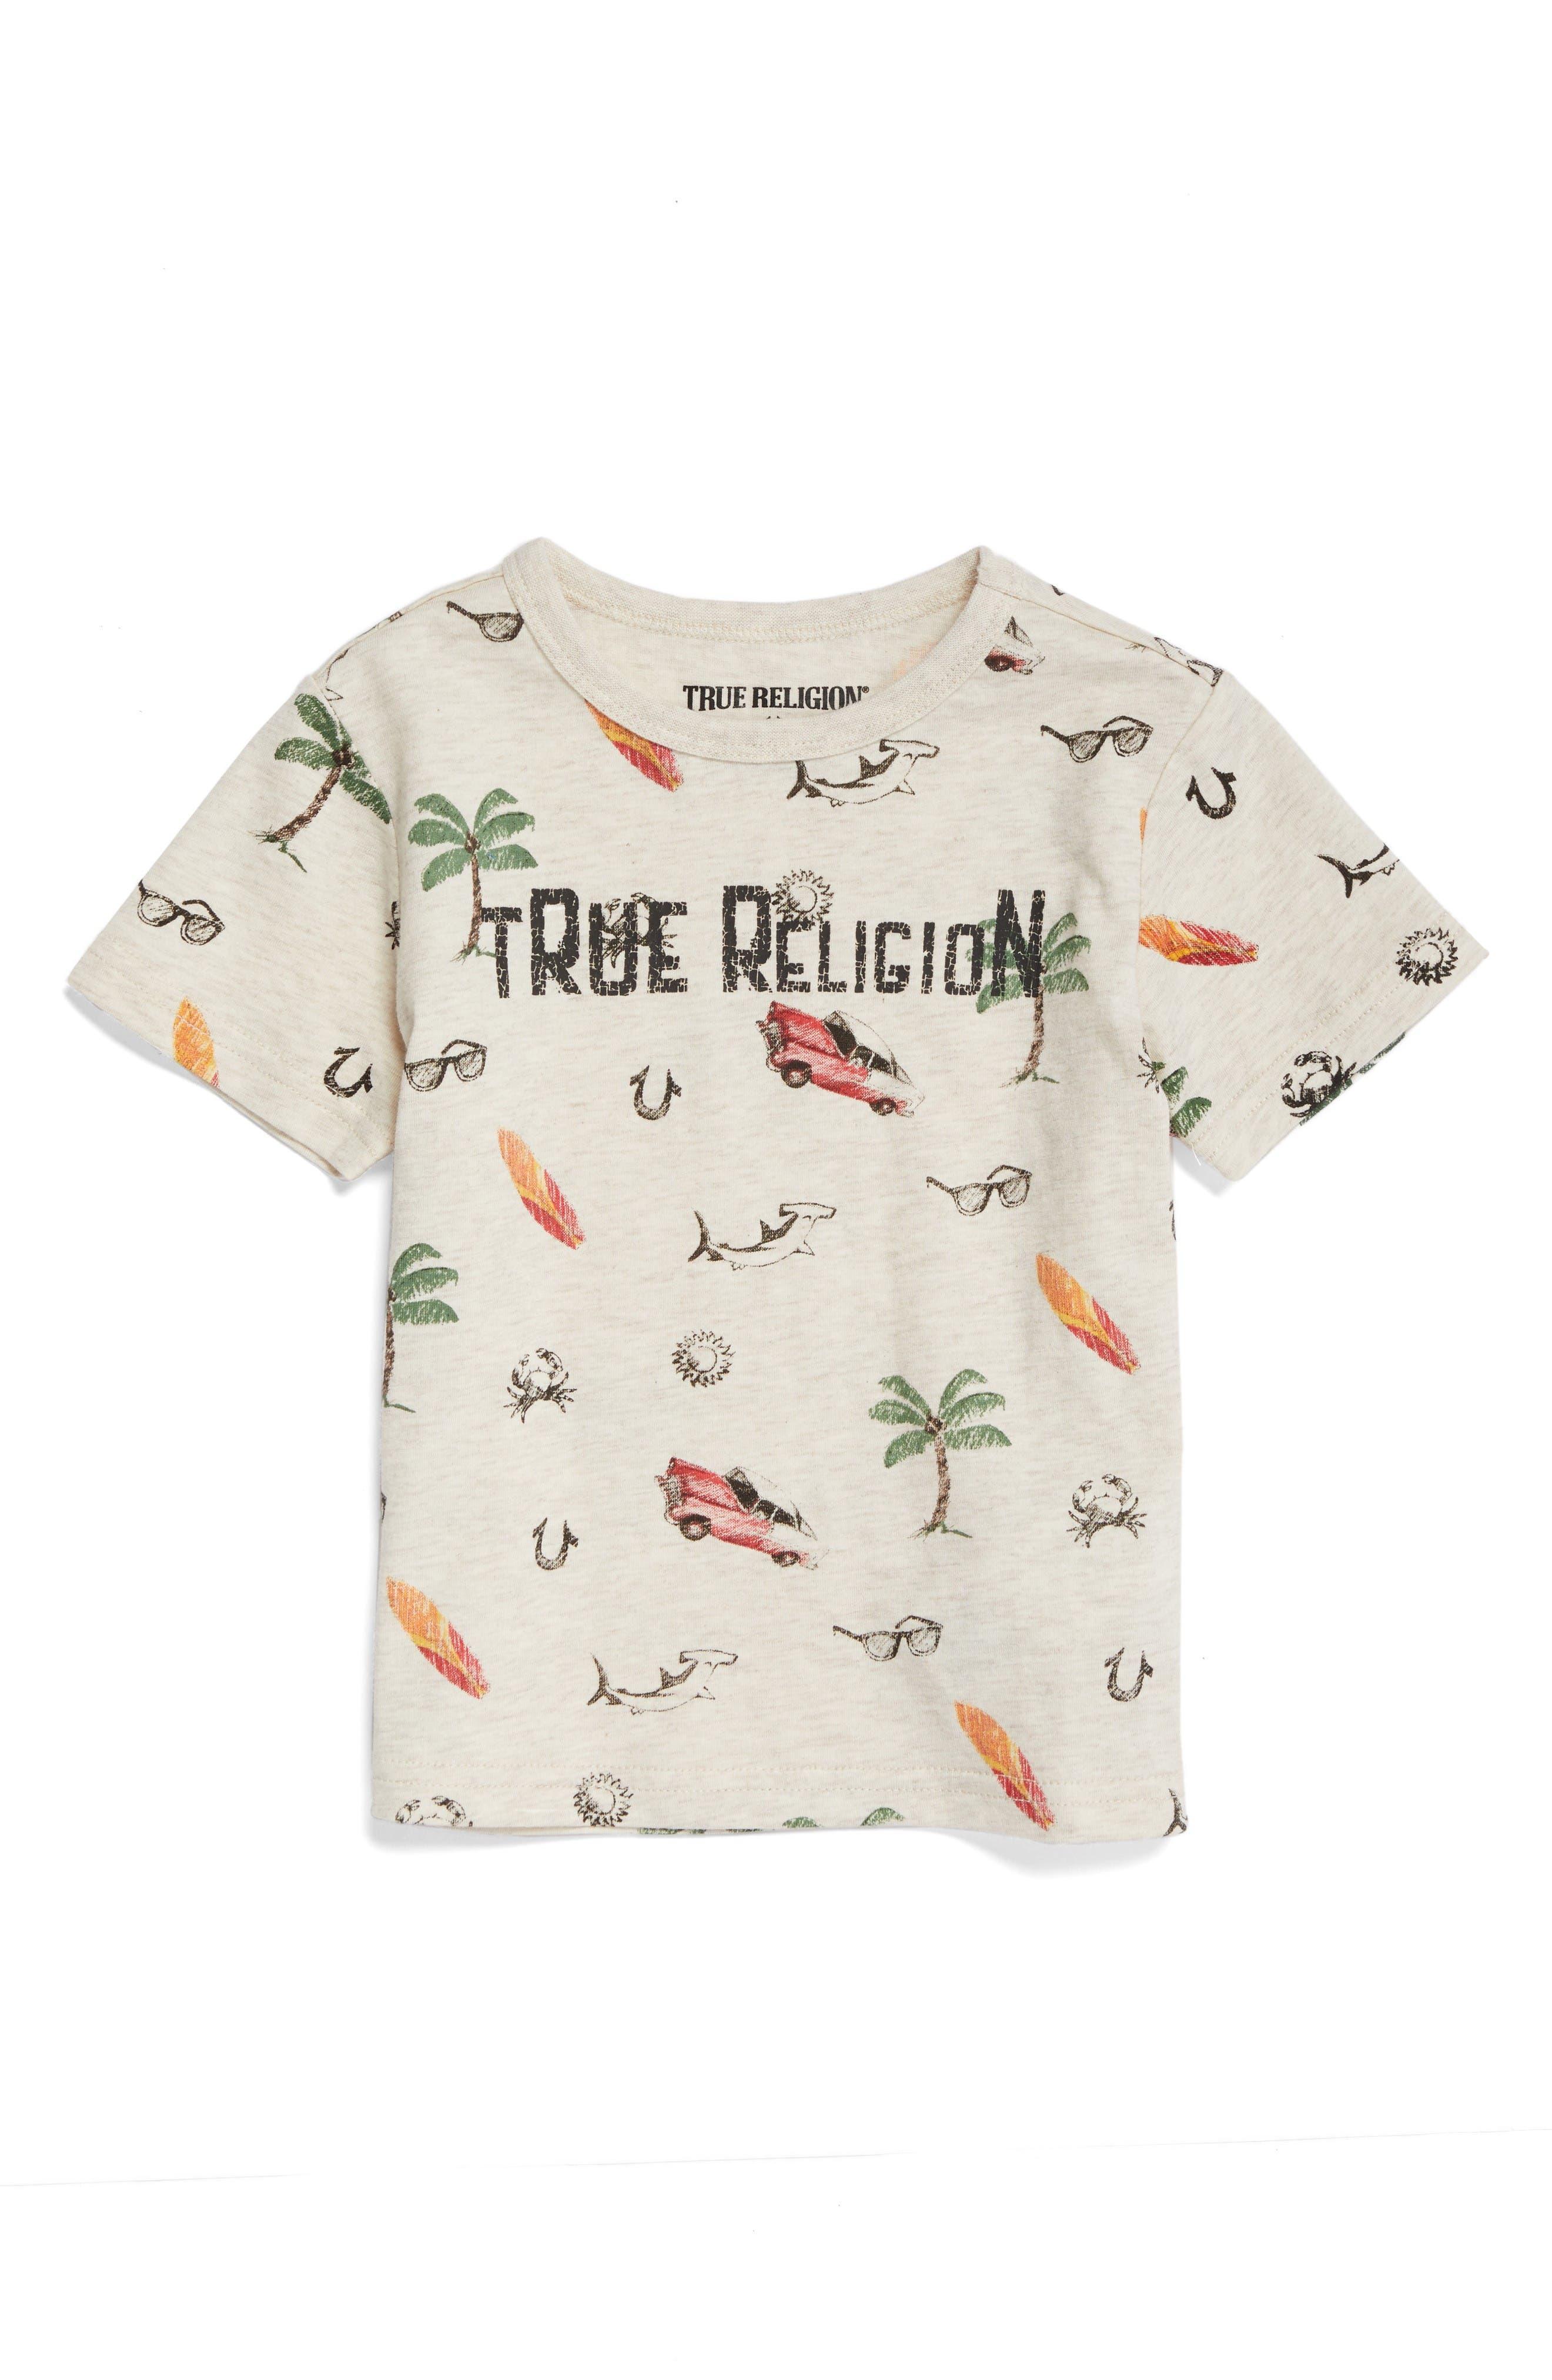 True Religion Retro Doodle T-Shirt (Baby)